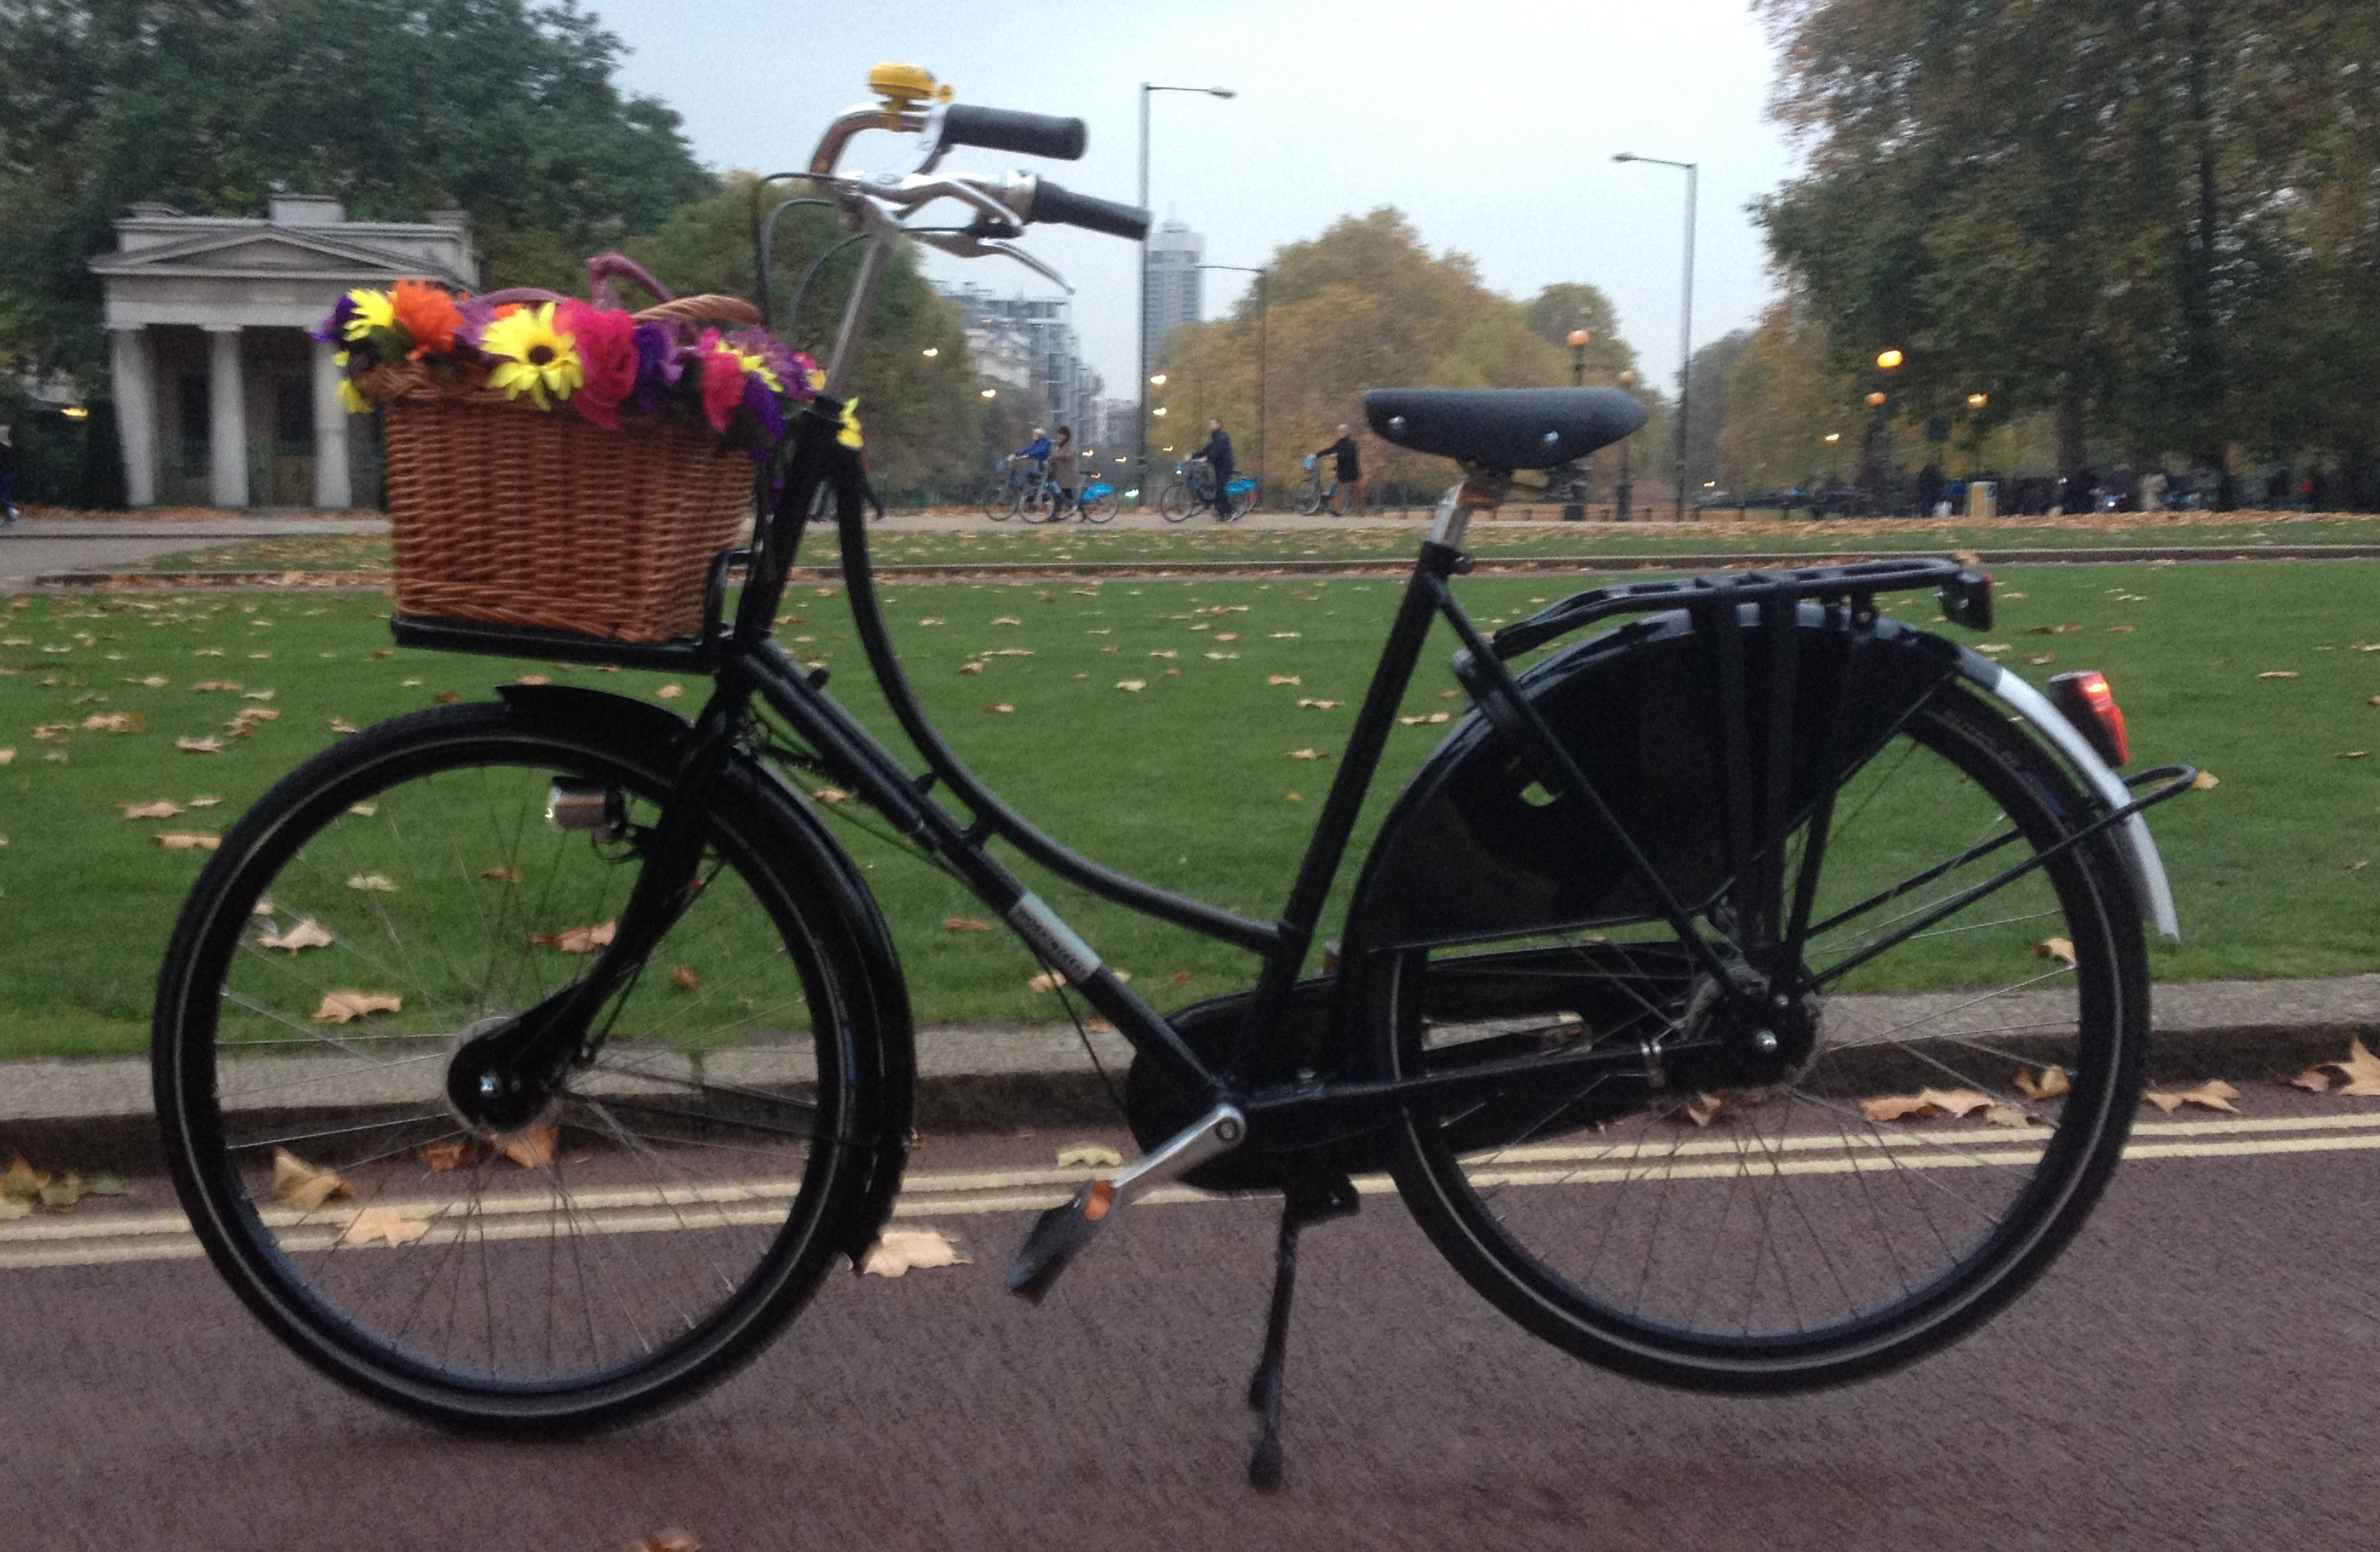 Best Grandma Ever Floral Bicycle Handlebar Bike Bell